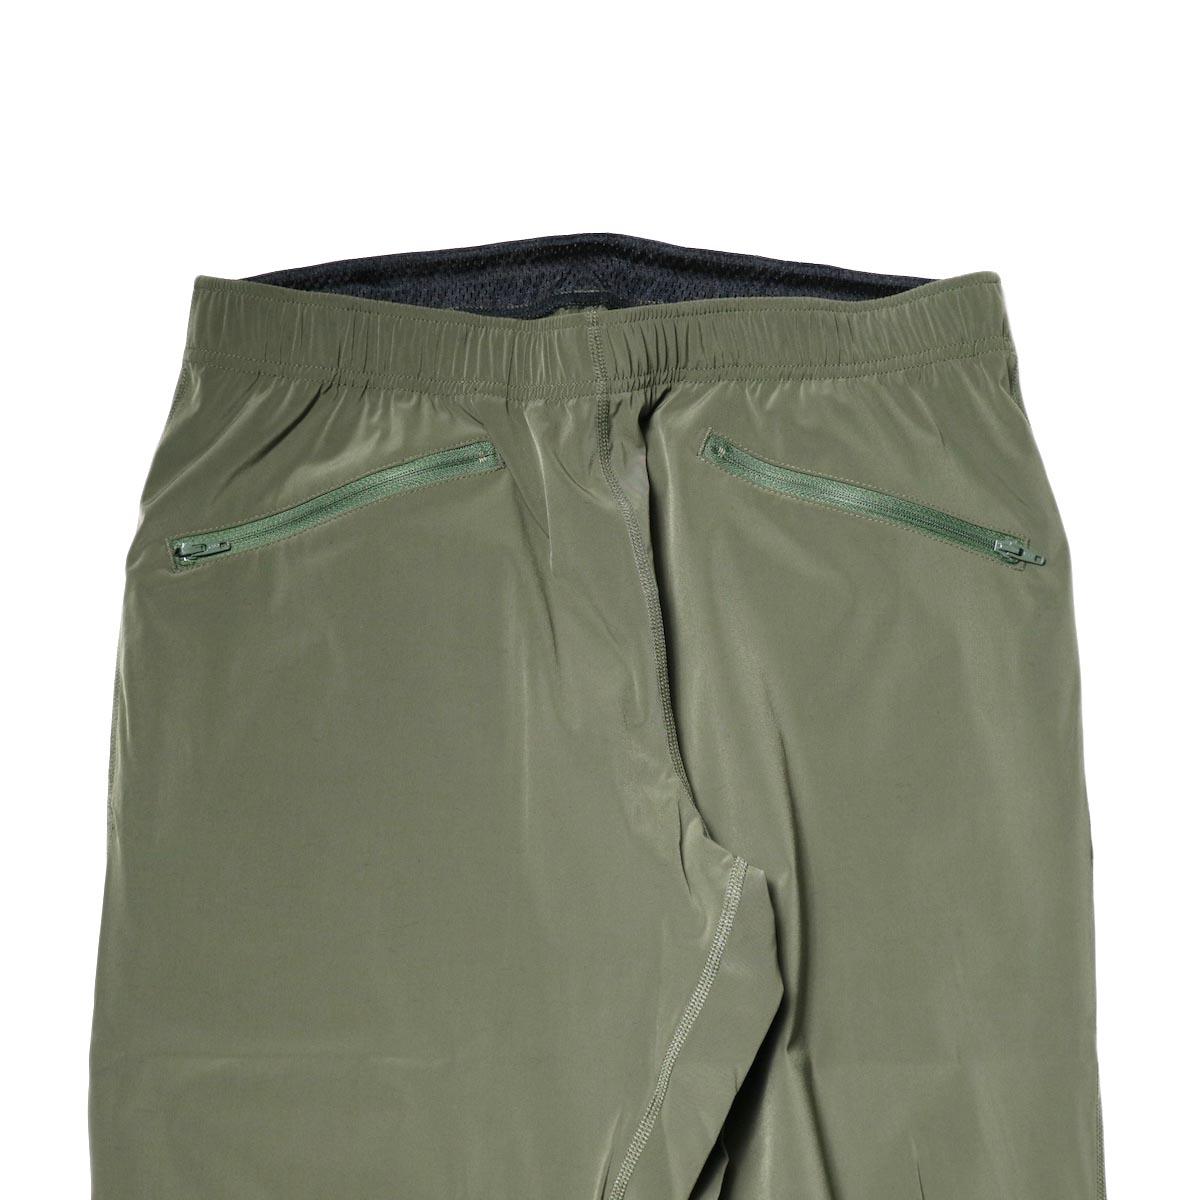 South2 West8 / 2P Cycle Pant -N/Pu Taffeta (Olive)正面ポケット